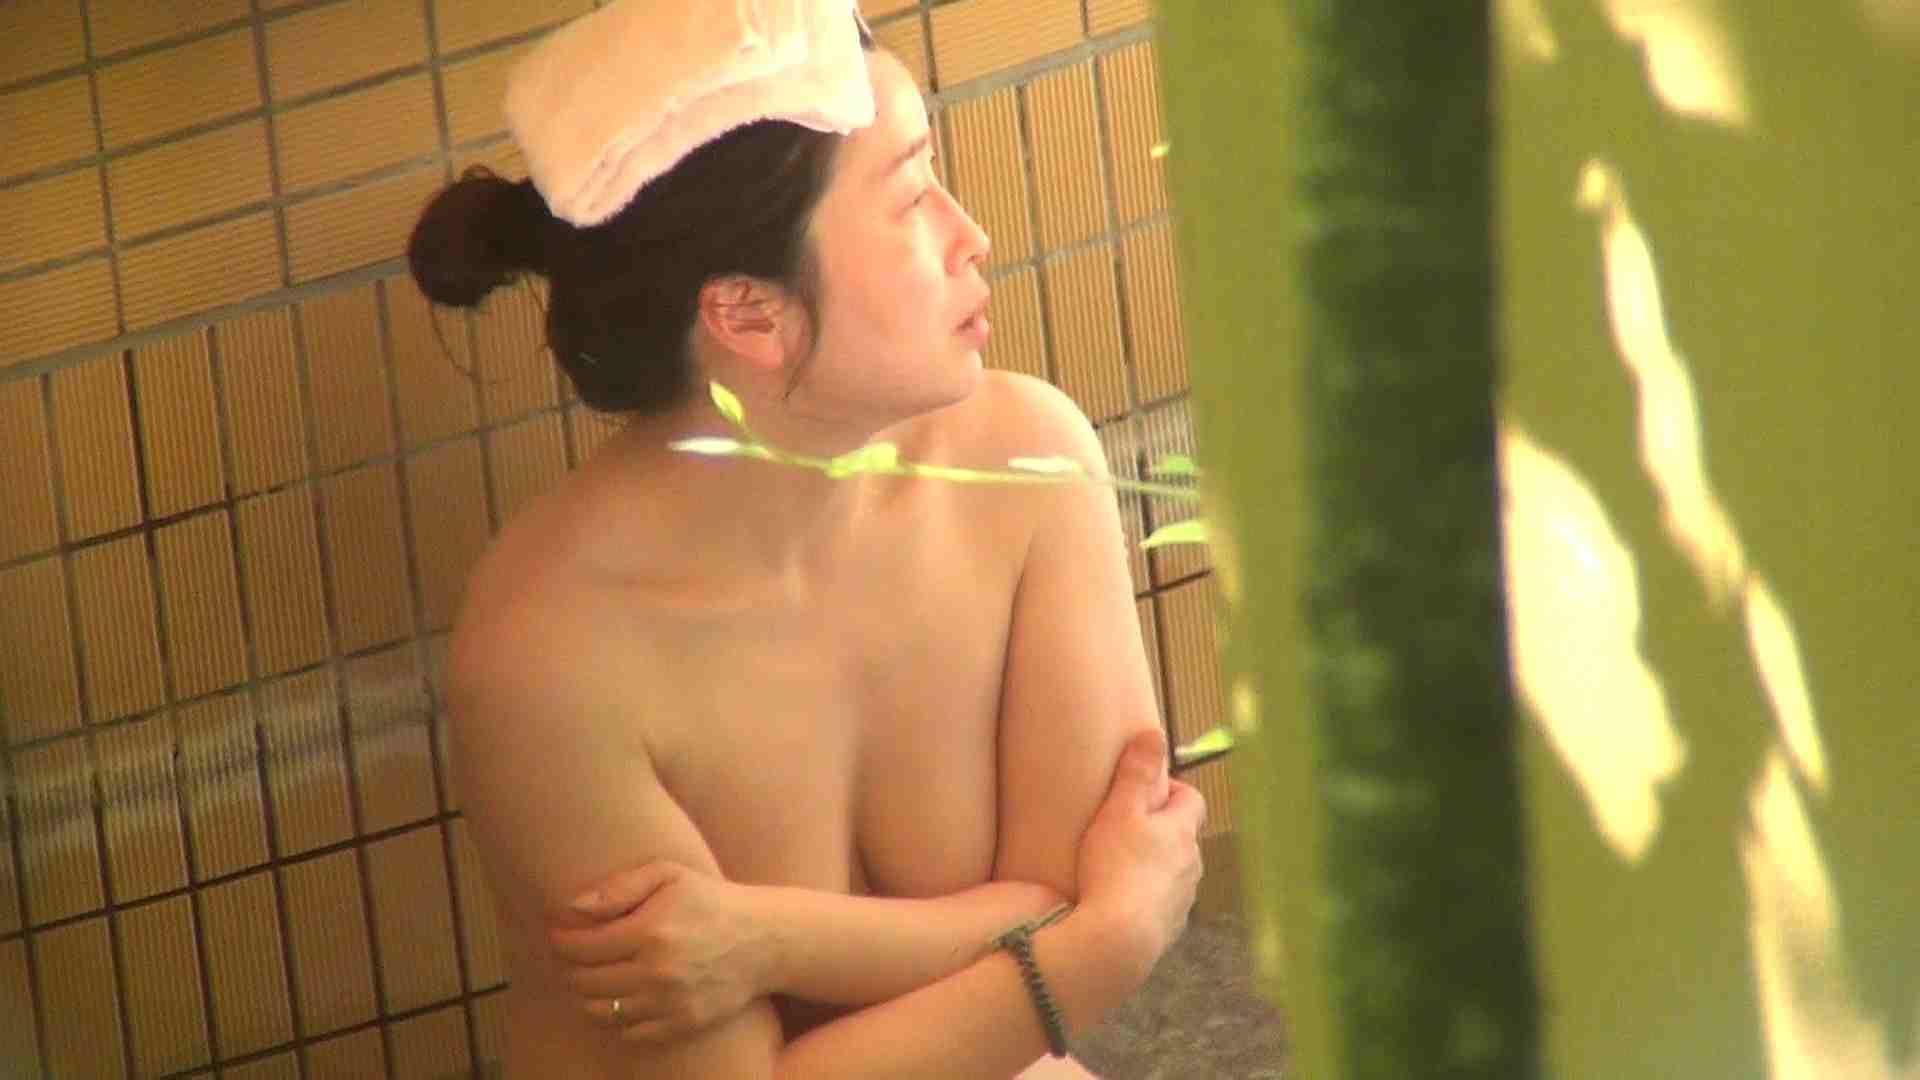 Aquaな露天風呂Vol.305 盗撮シリーズ | 露天風呂編  86PIX 29